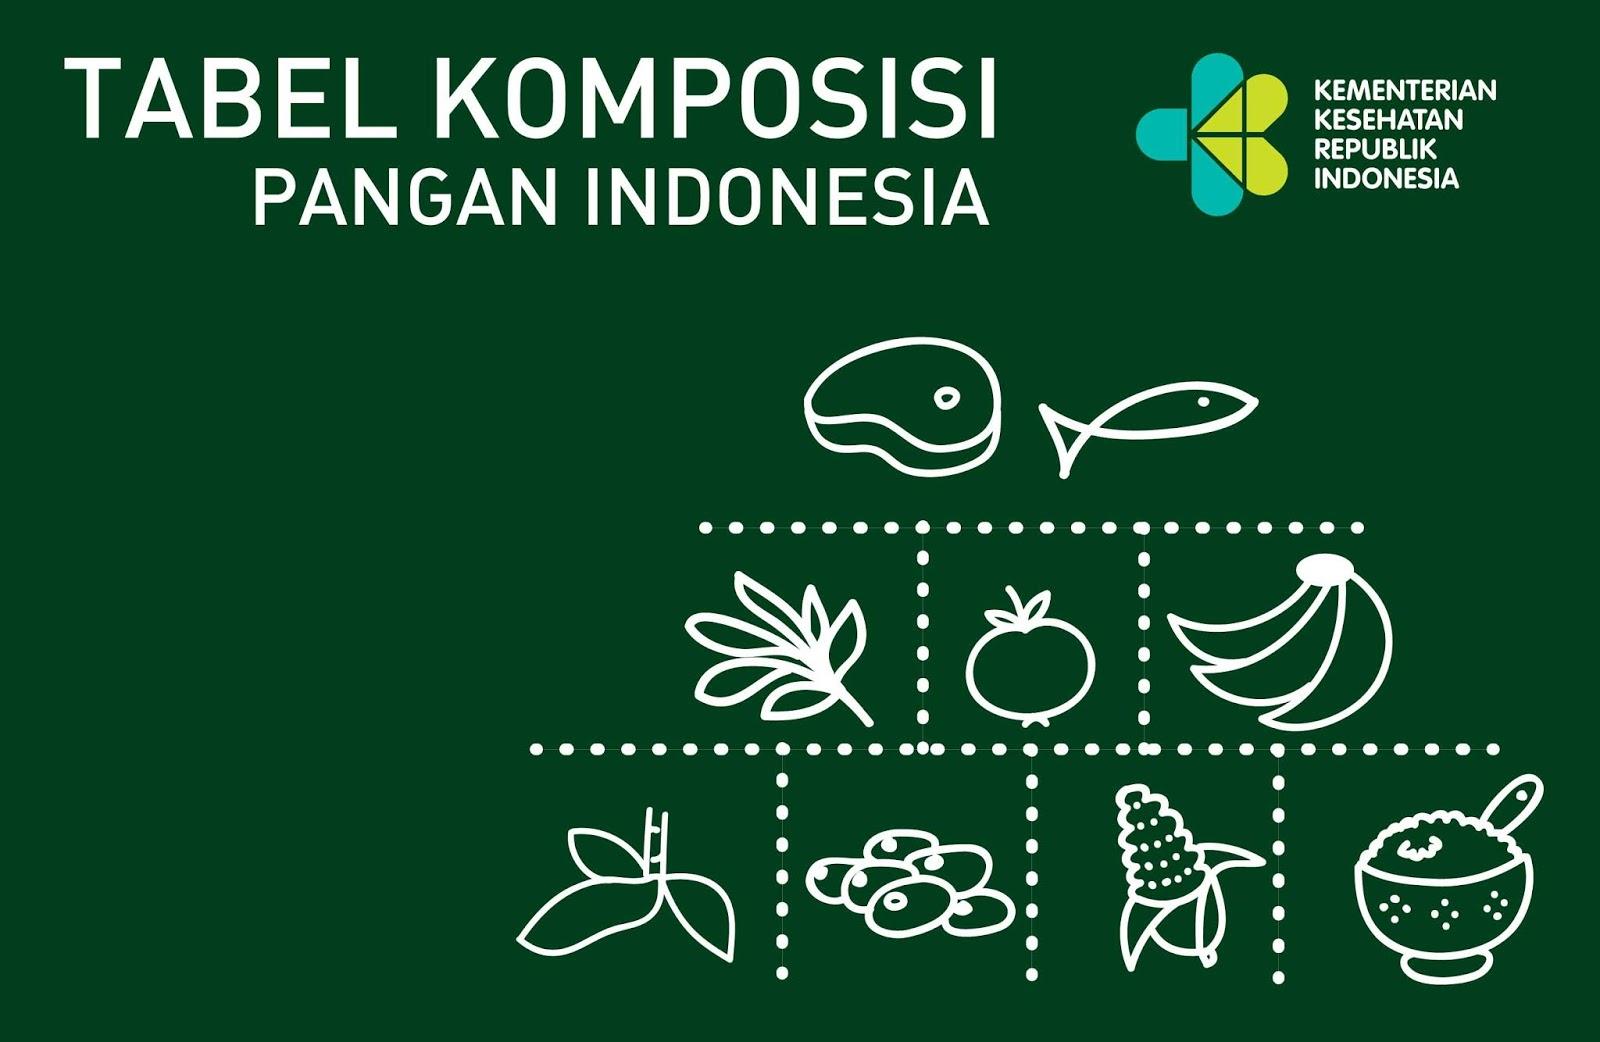 Tabel Komposisi Pangan Indonesia (TKPI) Terbaru - GiziKlinikKu